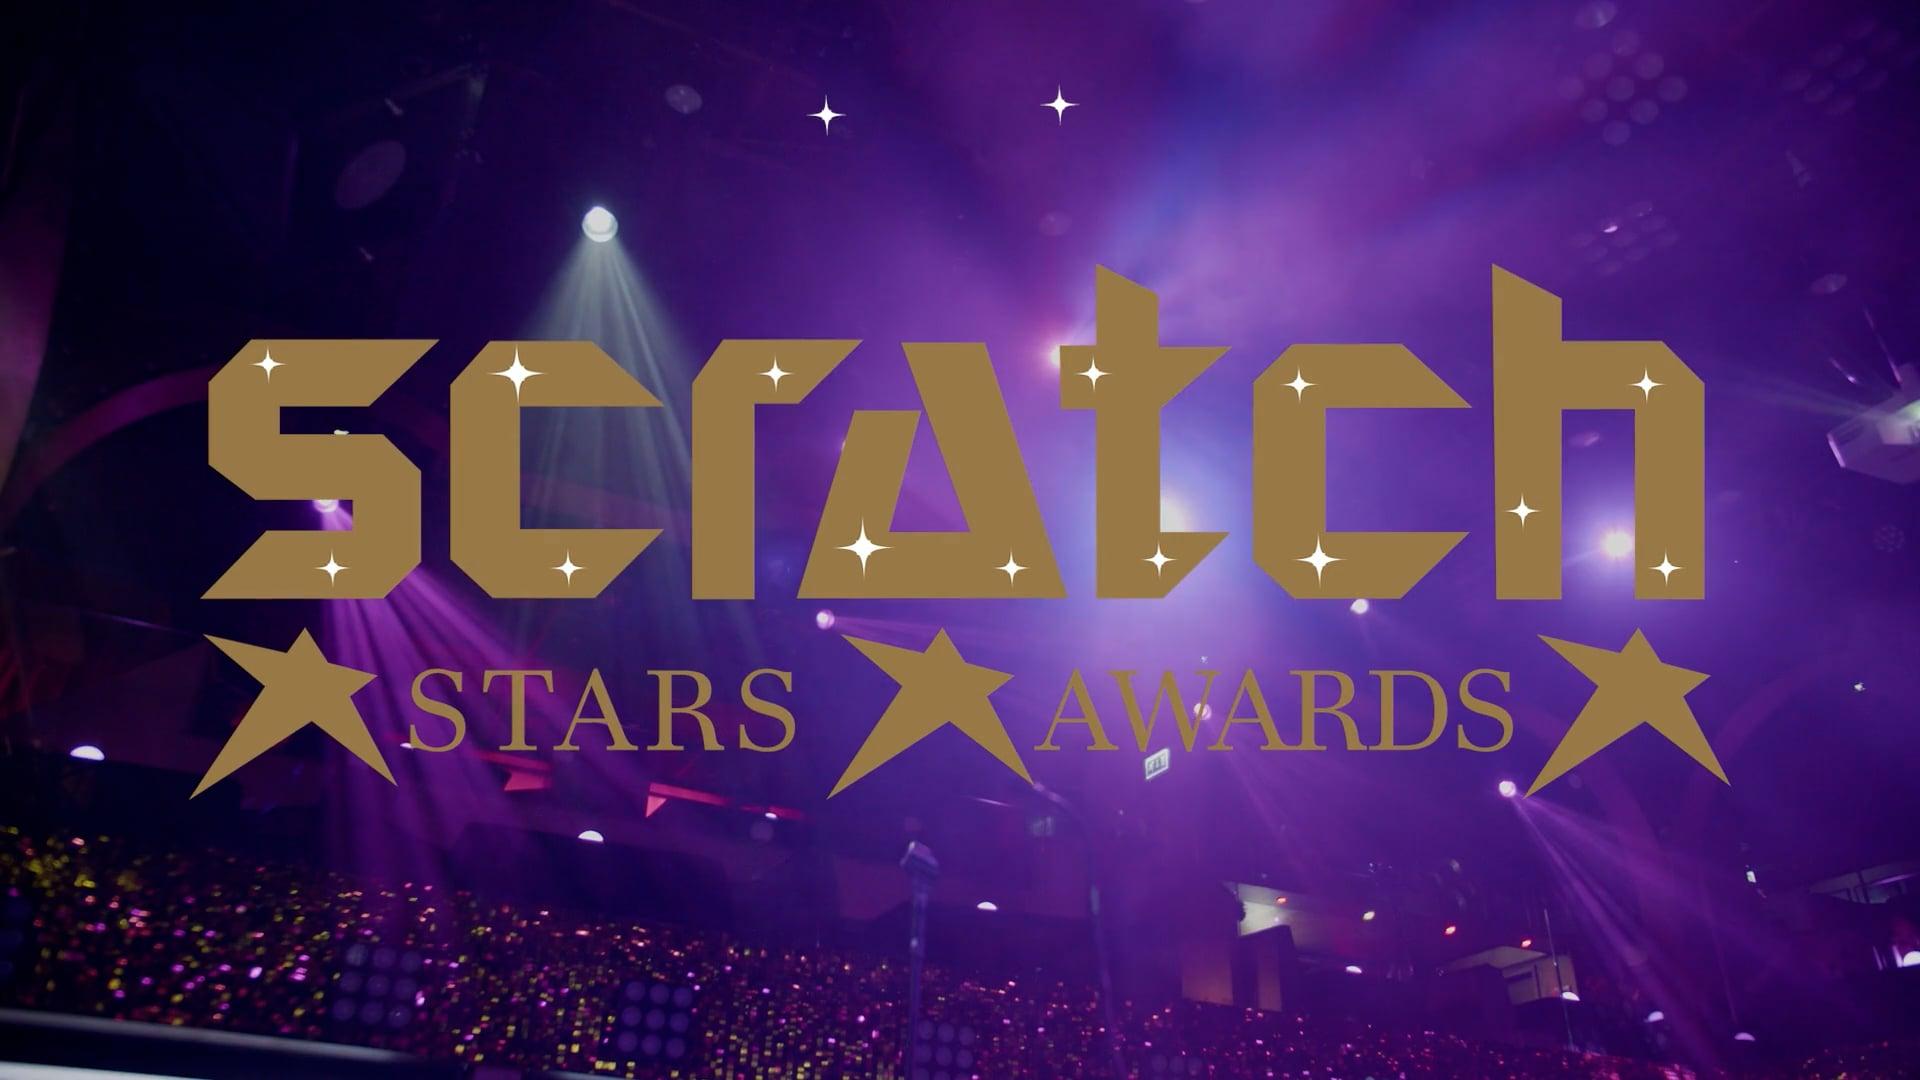 Scratch Awards 2021